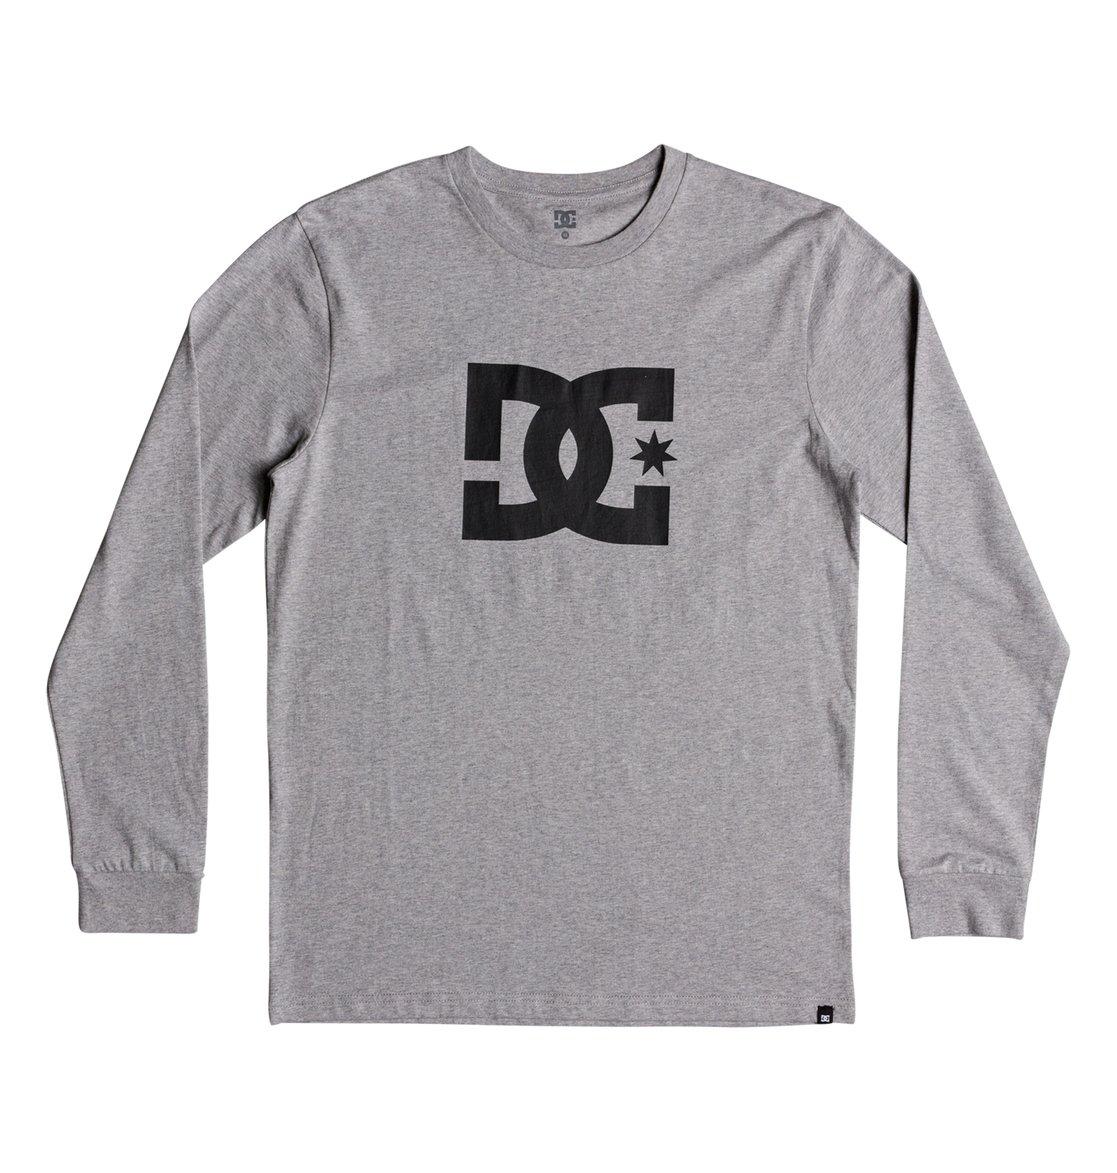 4593a66f28 0 Star - Long Sleeve T-Shirt for Boys 8-16 EDBZT03282 DC Shoes